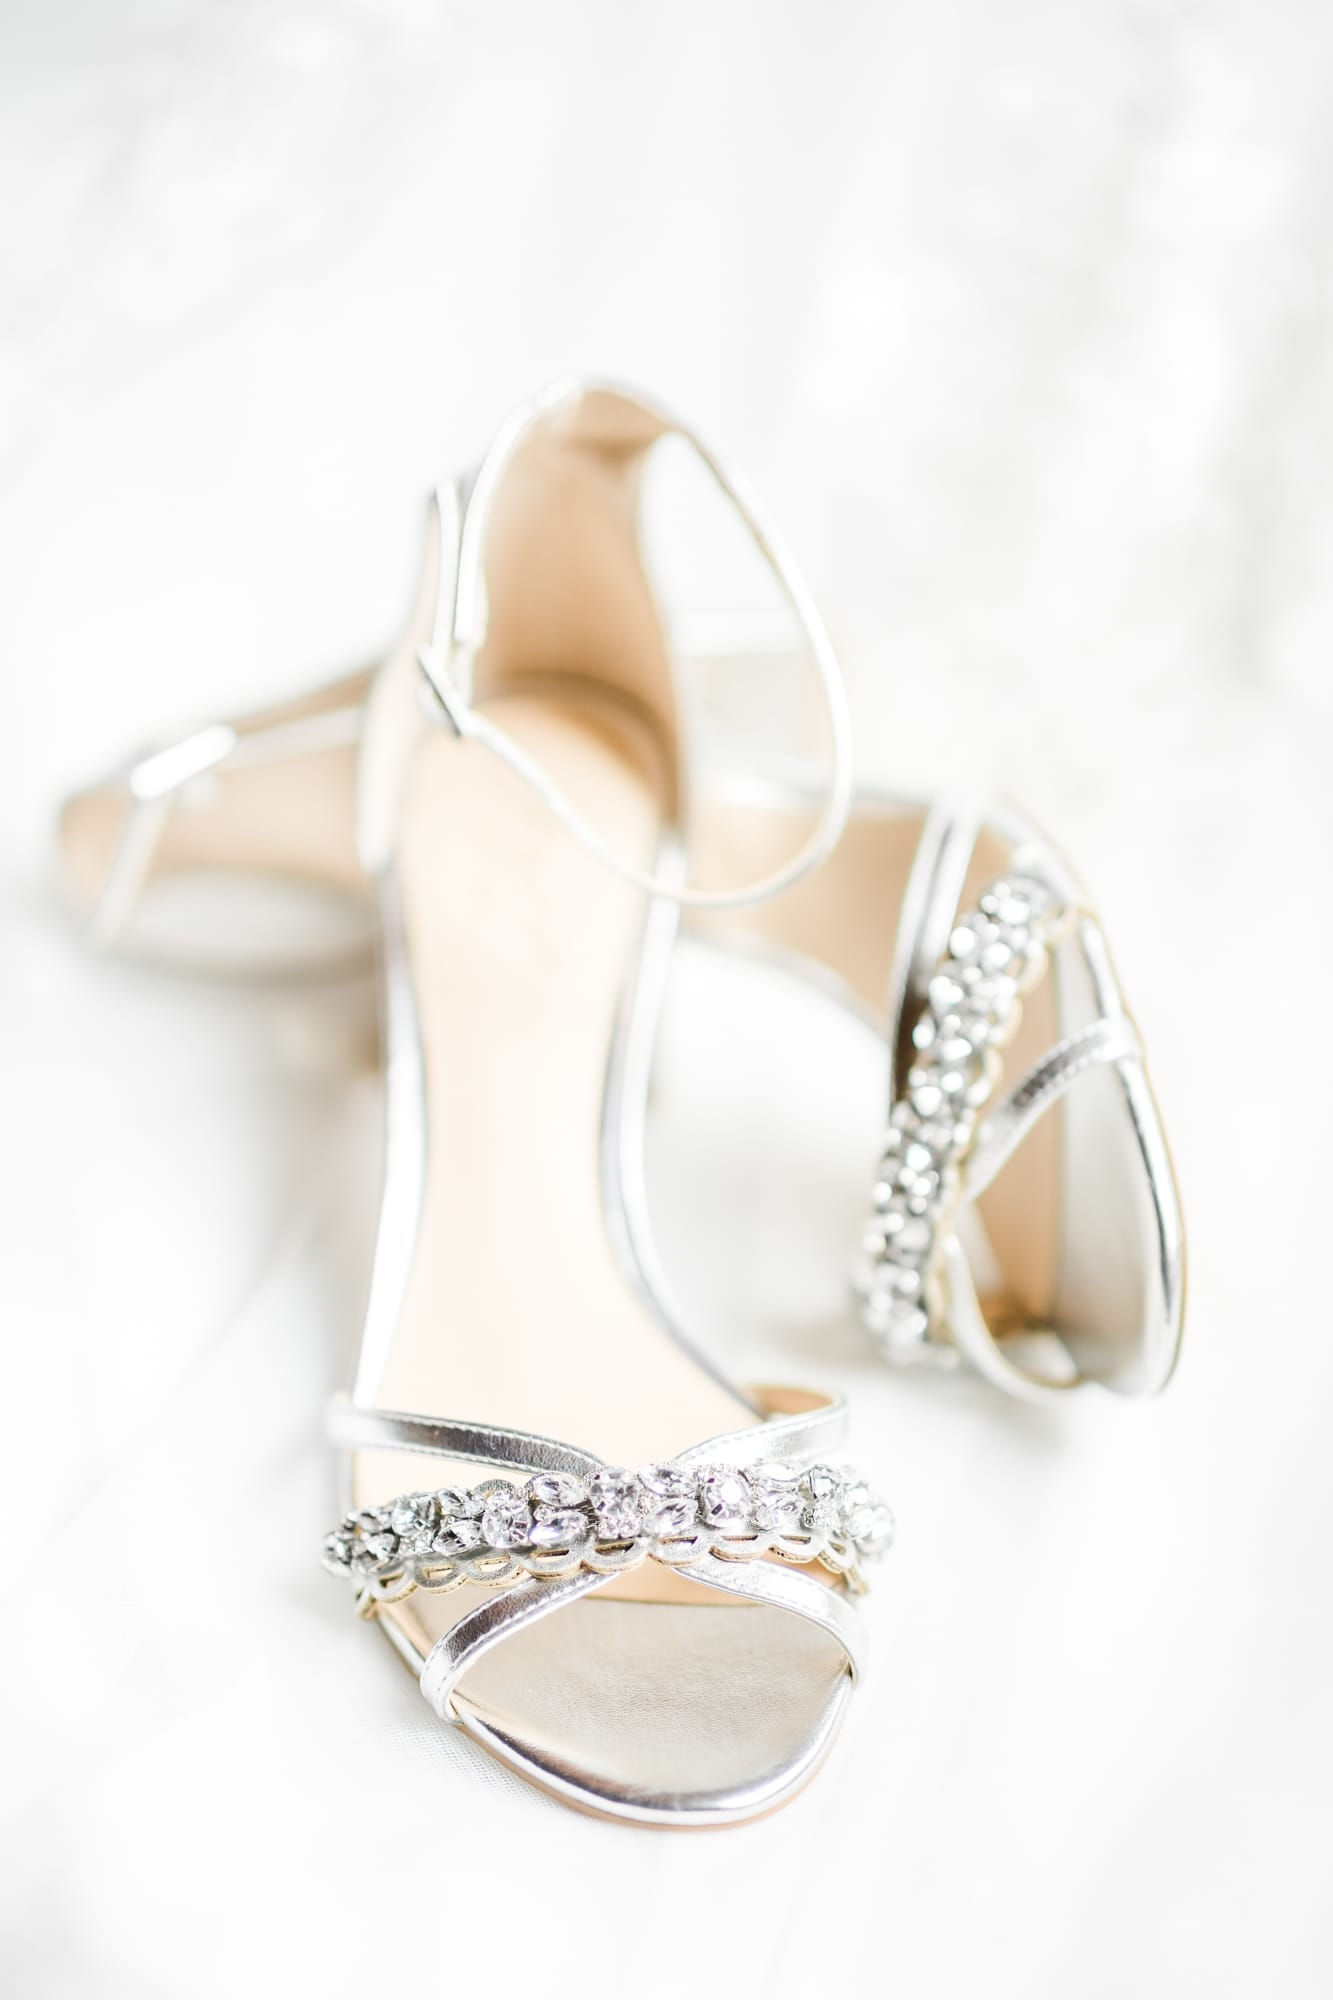 Bridal shoes at Rolling Rails Lodge wedding